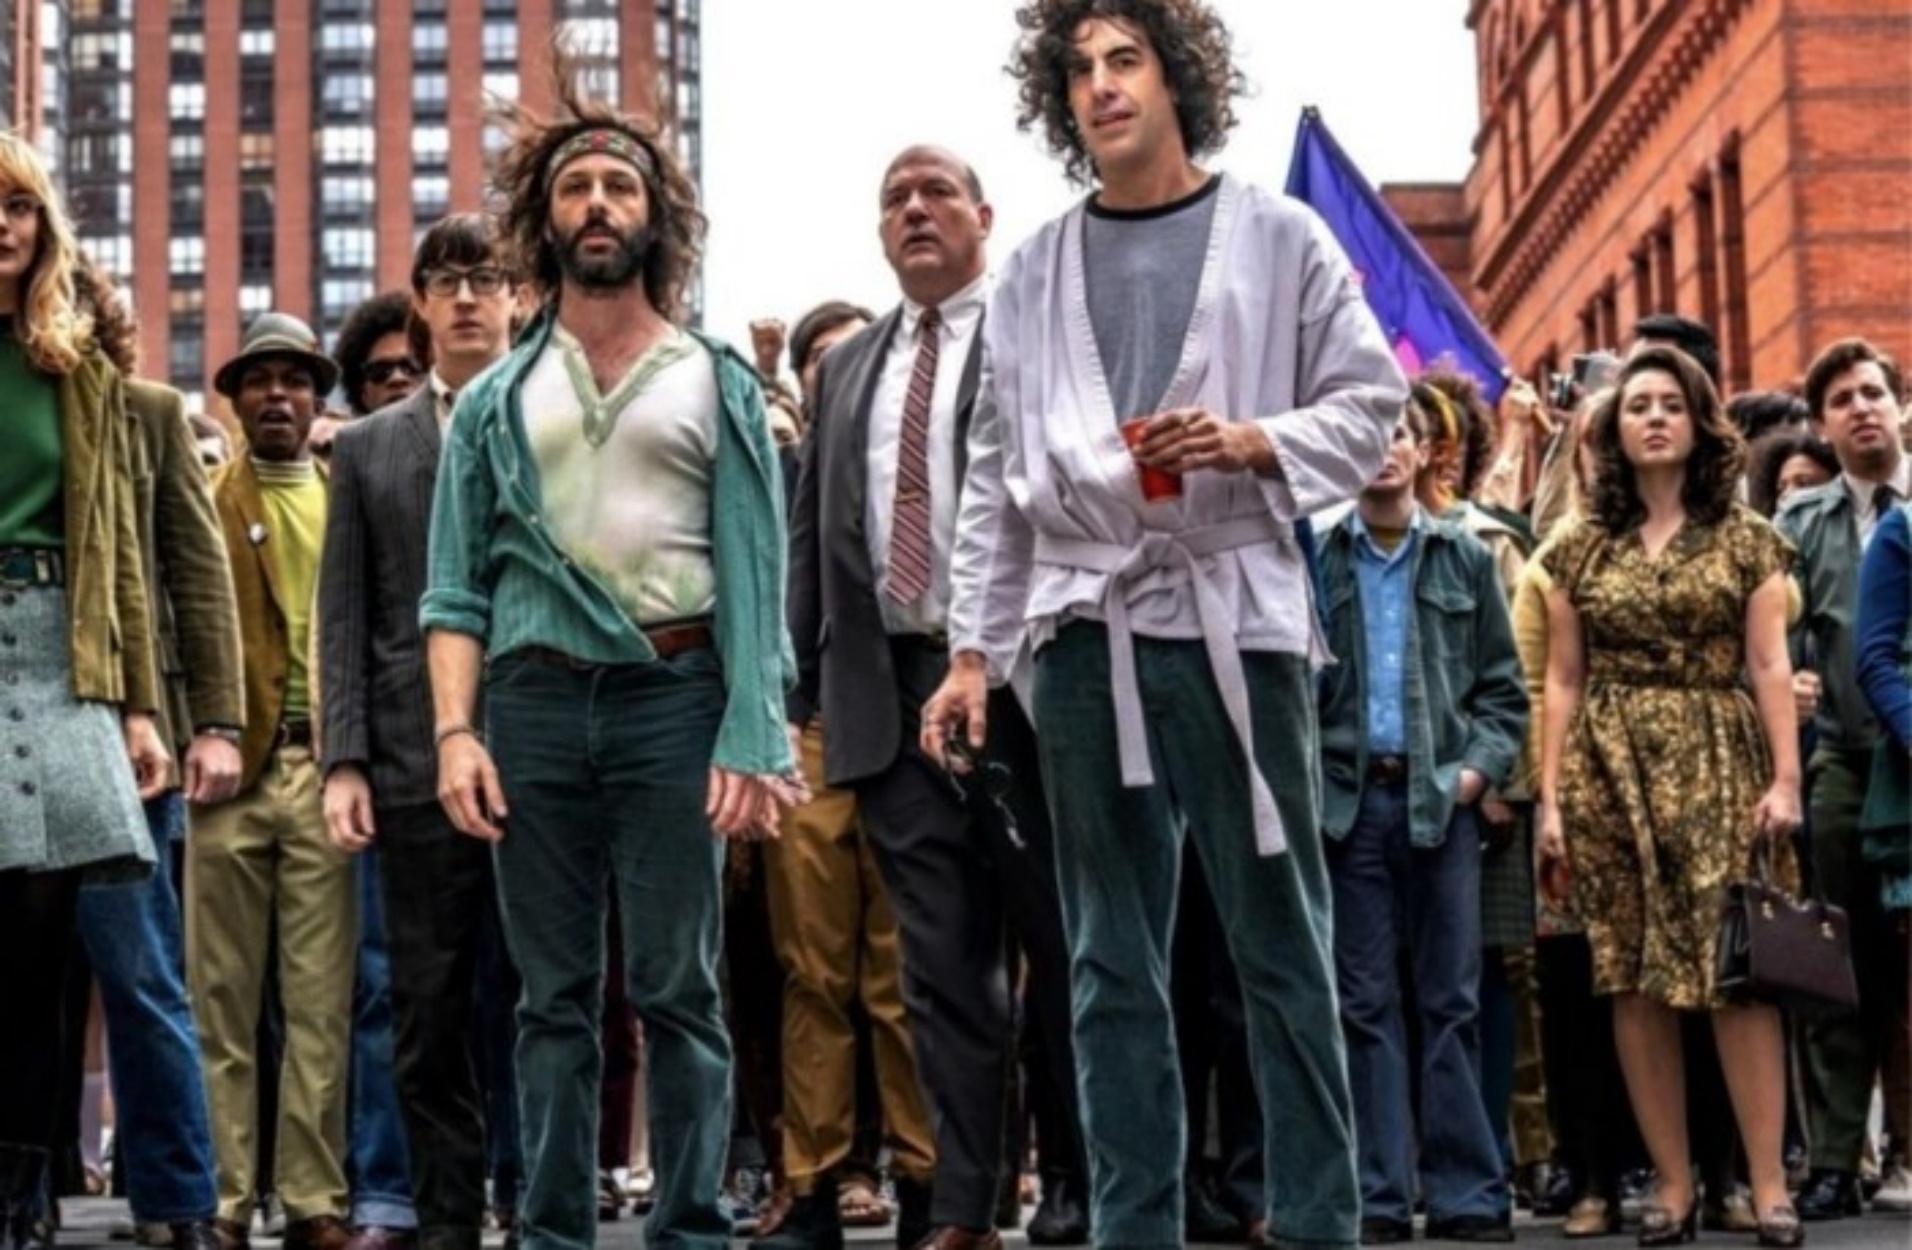 Netflix: 5 ταινίες που πρέπει να παρακολουθήσετε έστω μια φορά